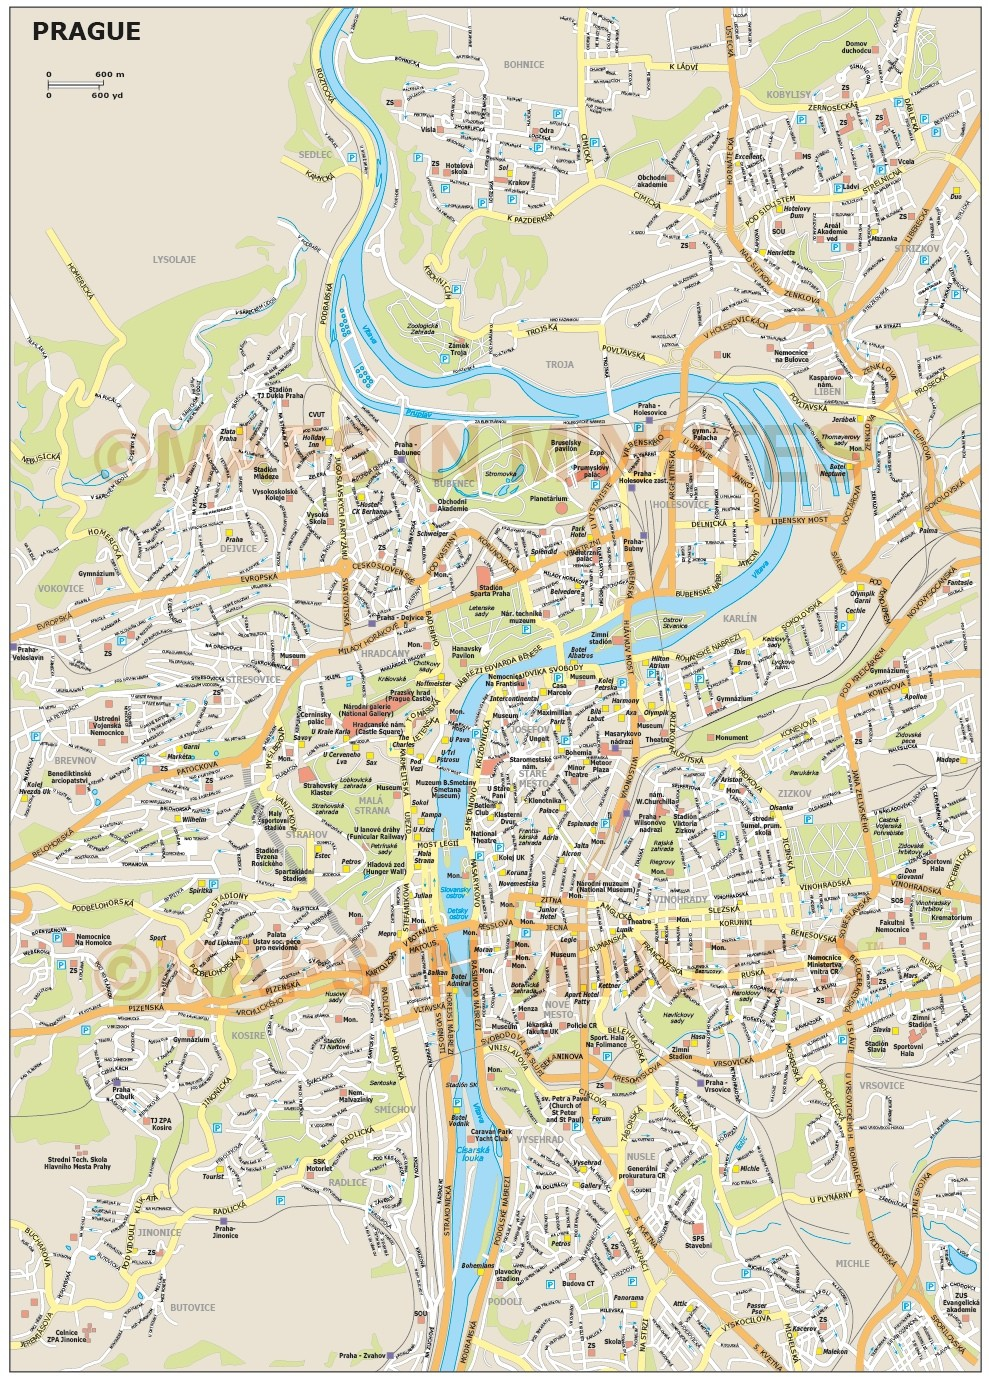 Free PDF maps of United States